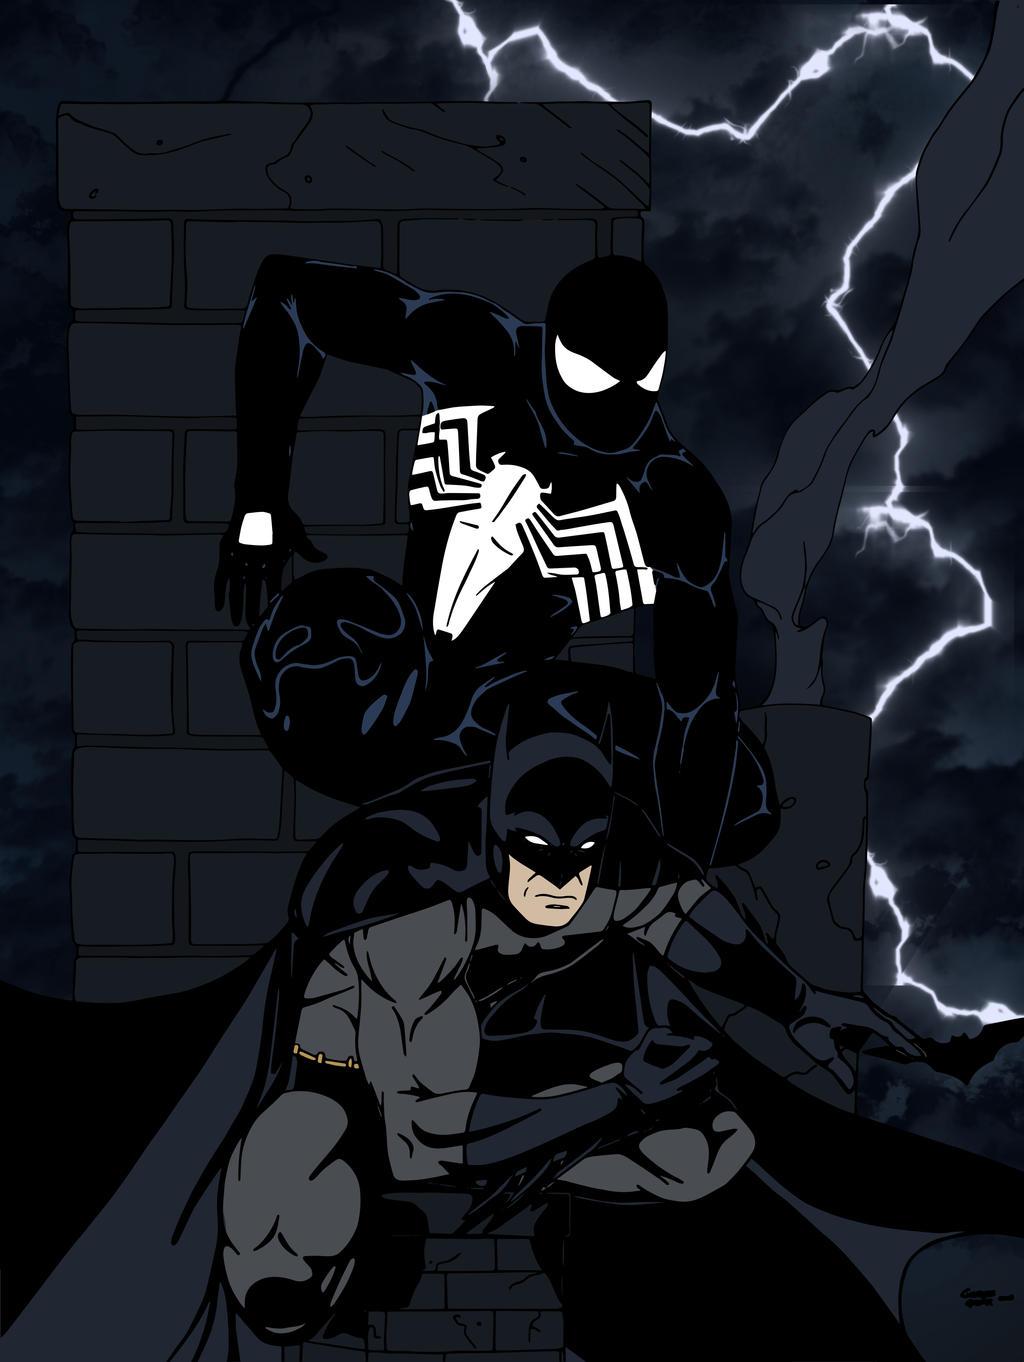 Batman and Black Suit Spider-Man II by edCOM02 on DeviantArt